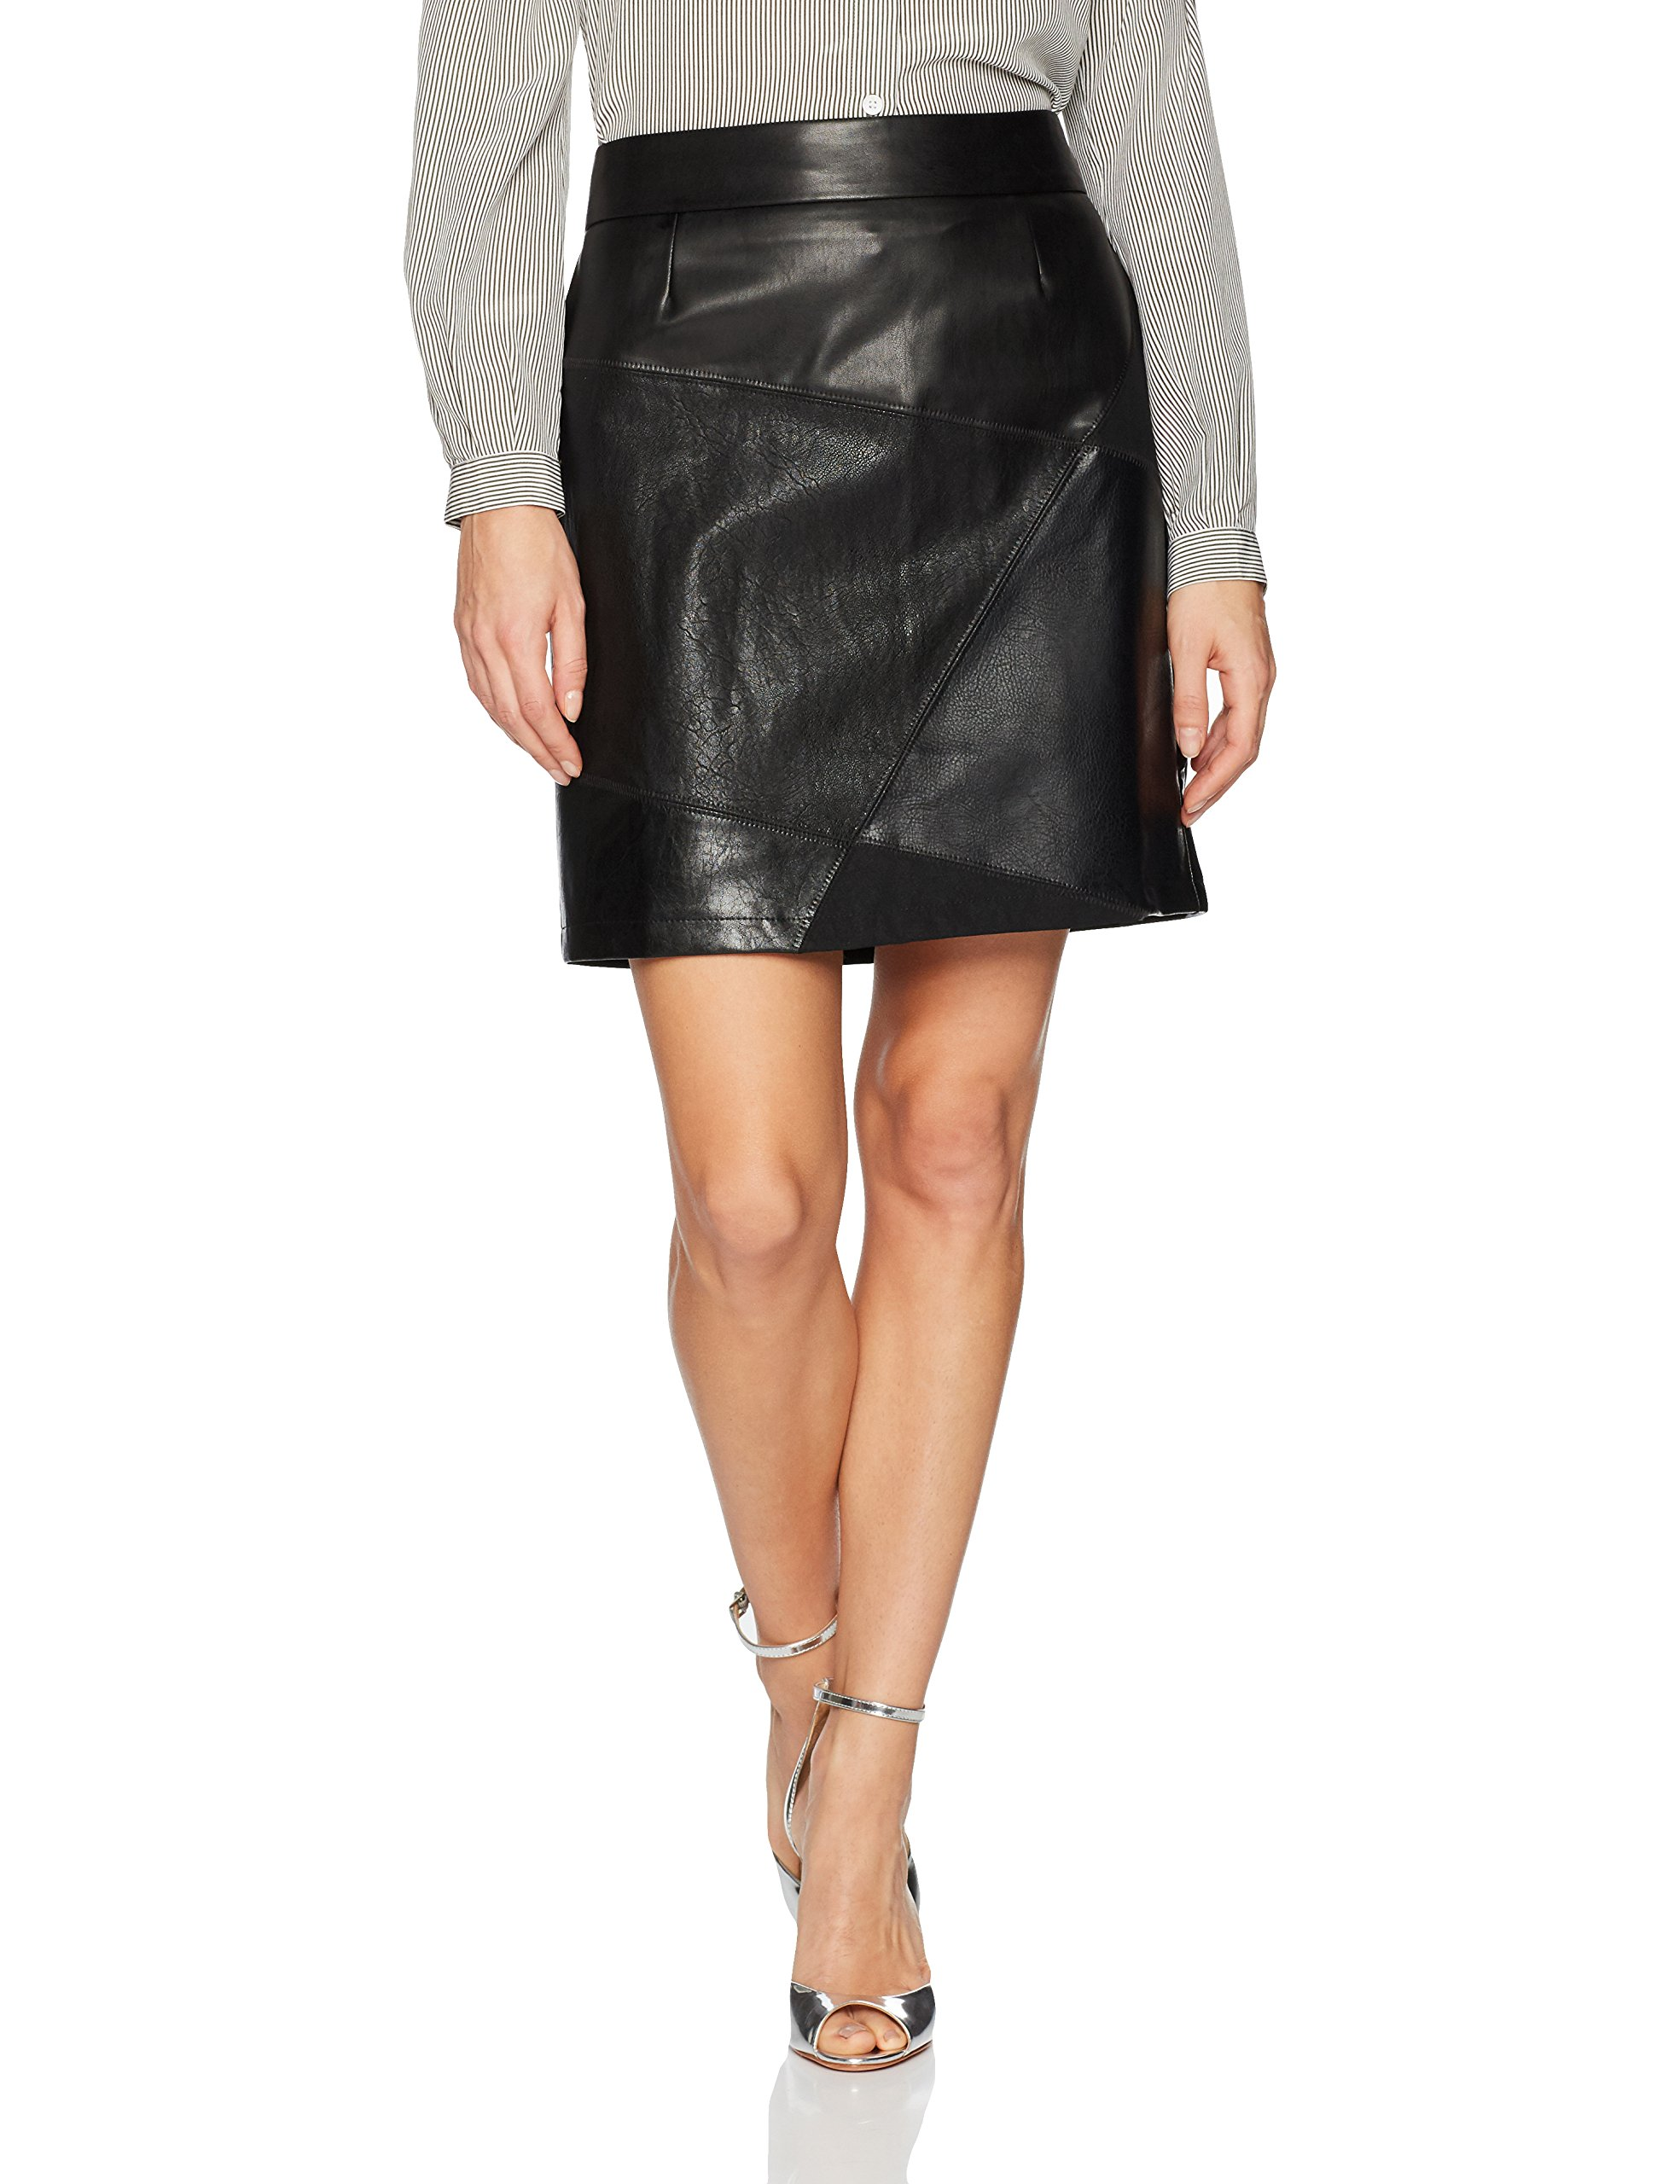 Desigual Women's Henry Woman Woven Short Skirt, black, S